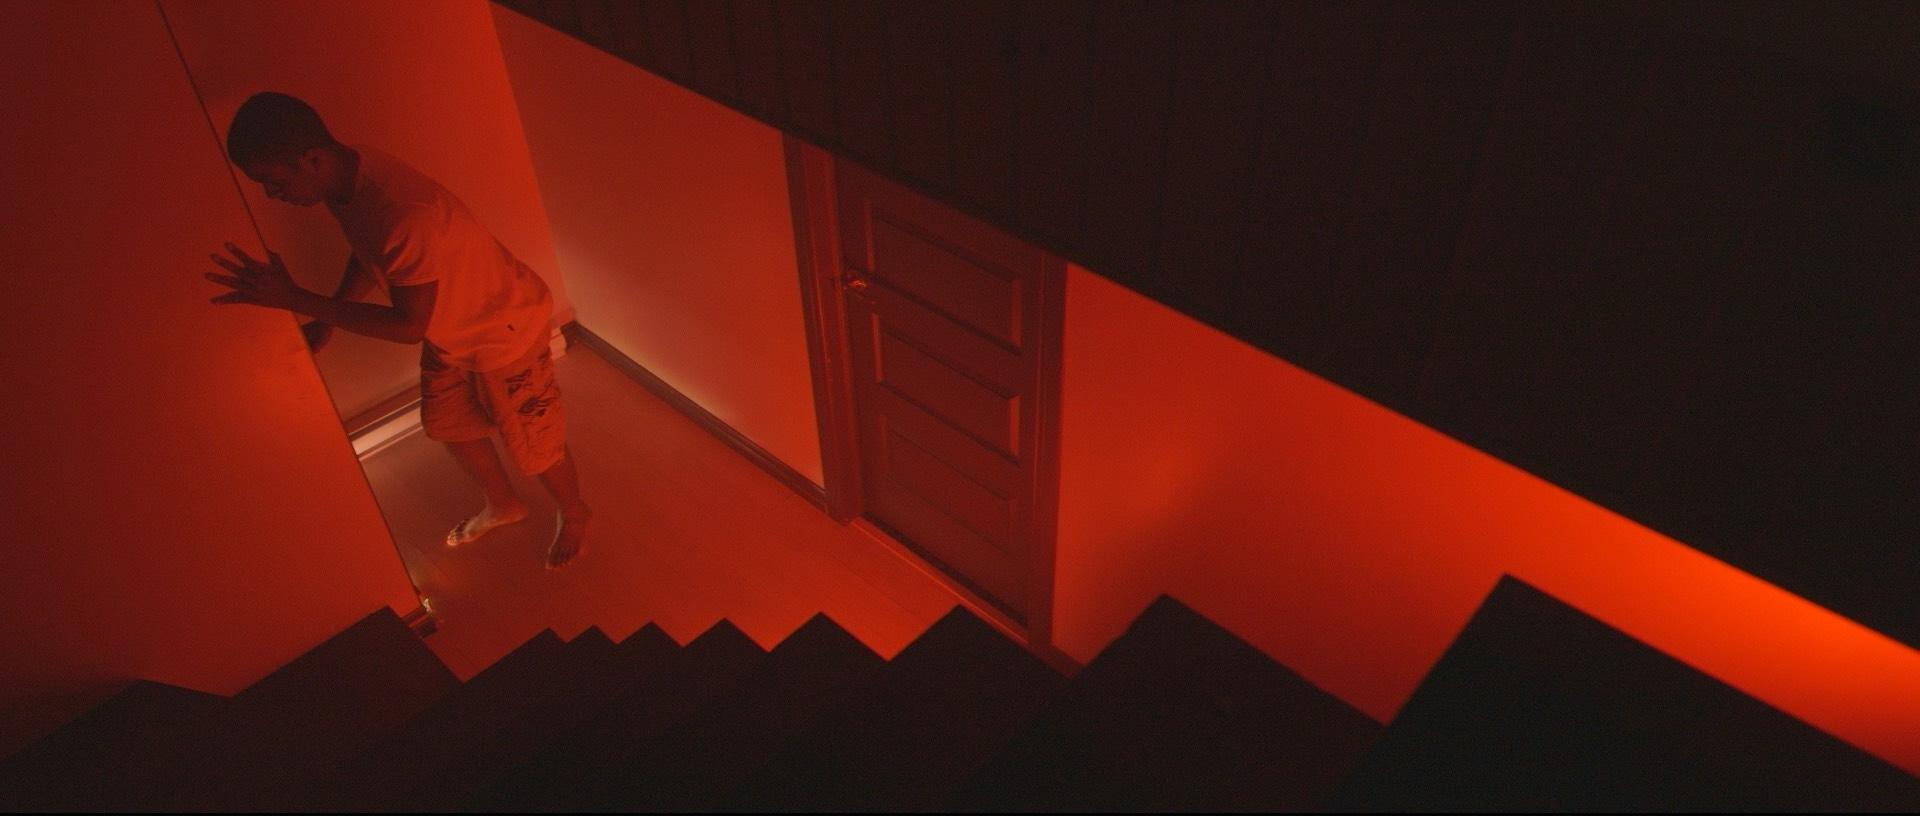 "Actor Sebastian Labissiere in a still from the short film ""Ellie"""